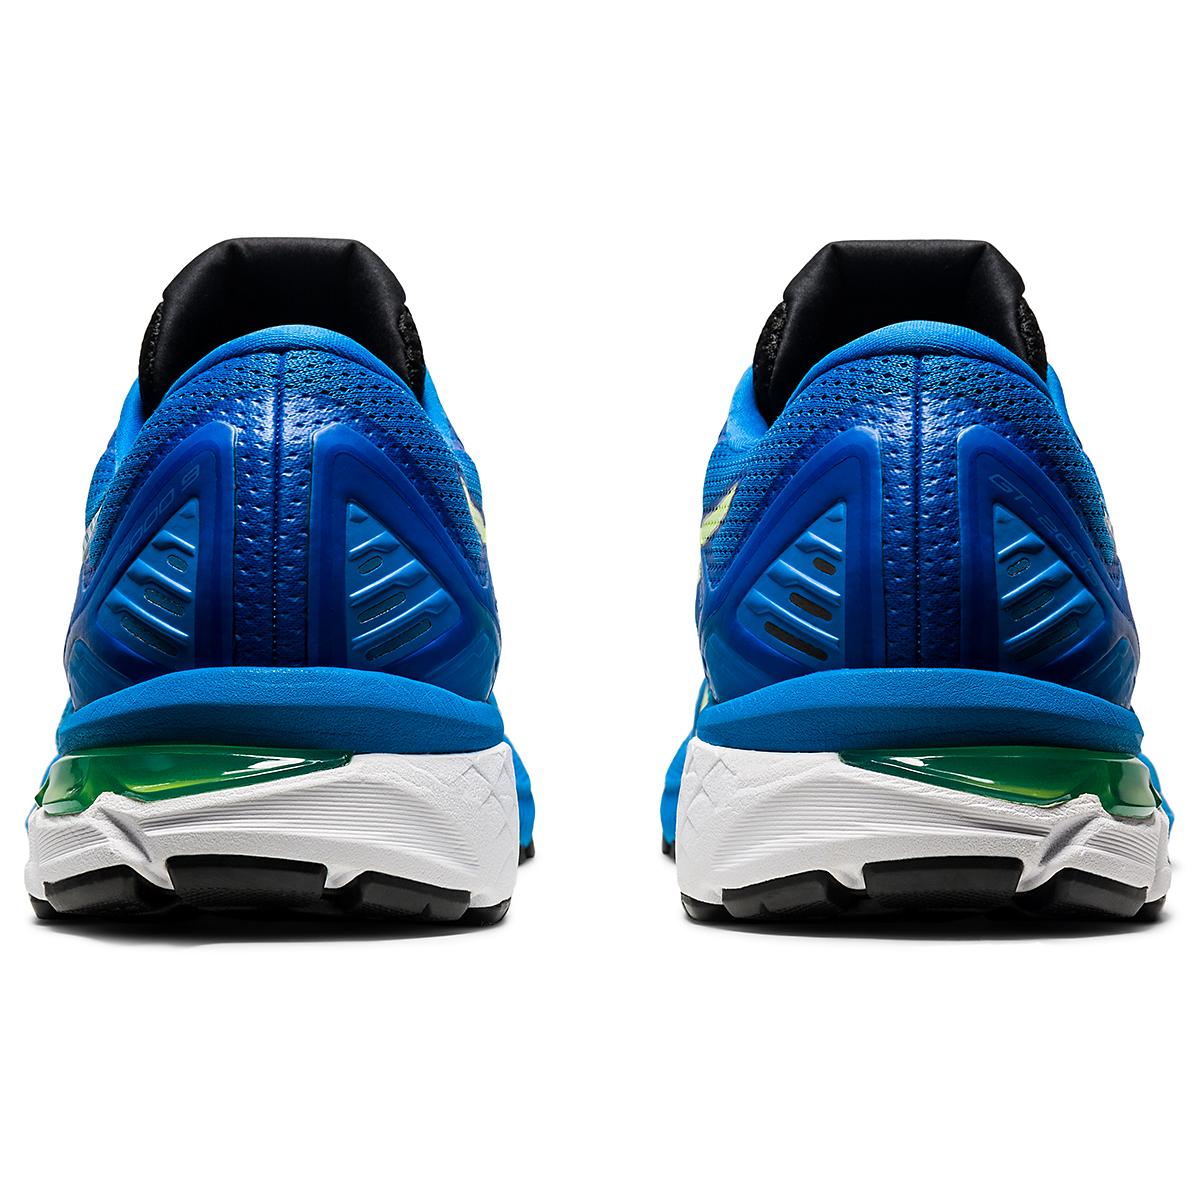 Men's Asics Gt-2000 9 Running Shoe - Color: Directoire Blue - Size: 7 - Width: Regular, Directoire Blue, large, image 3